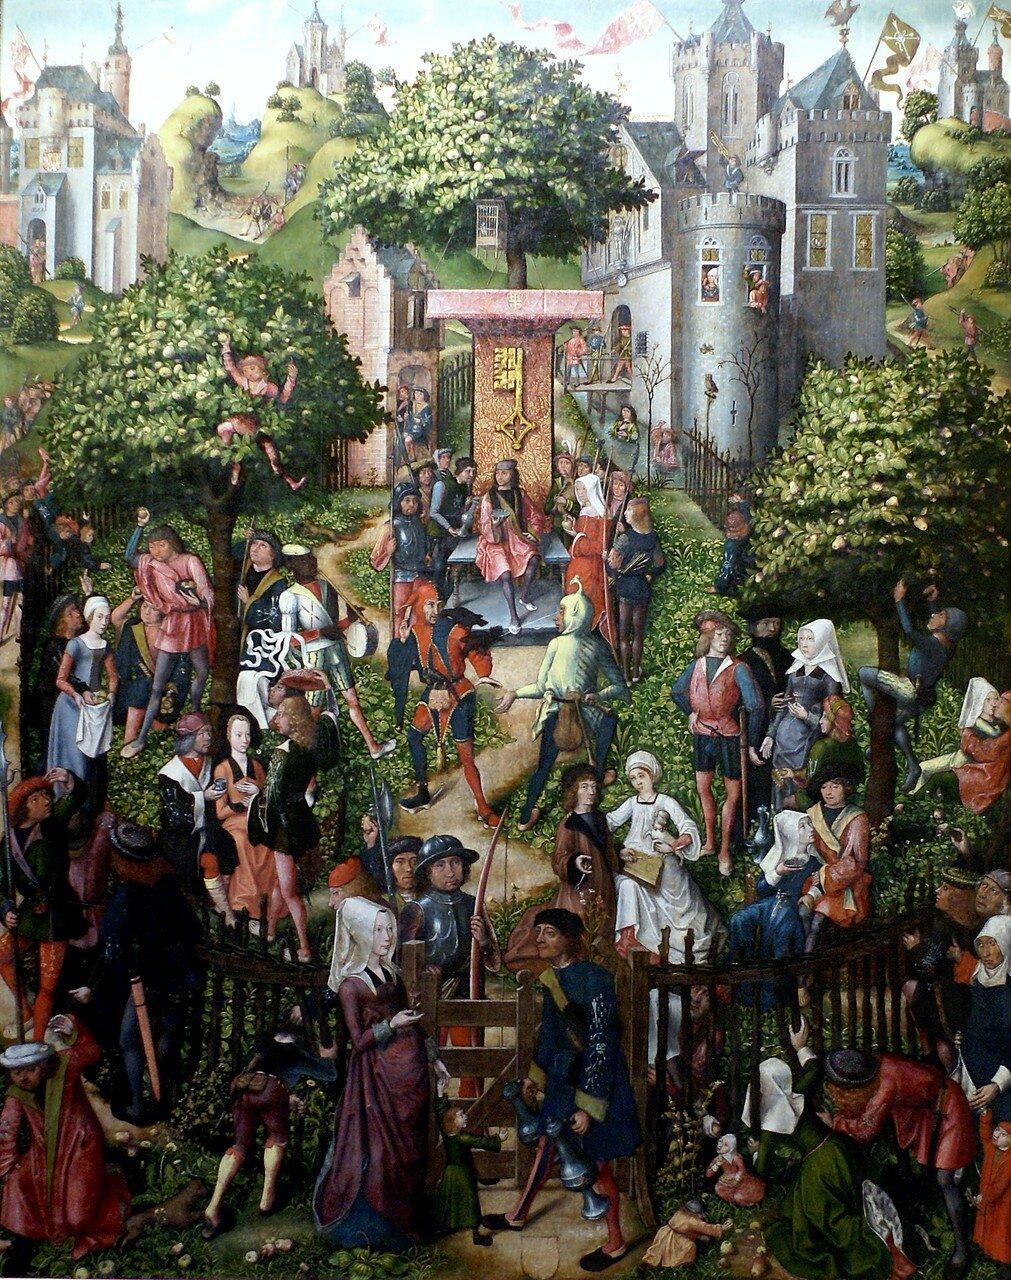 Master_of_Frankfurt,_Festival_of_the_Archers,_1493,_Royal_Museum_of_Fine_Arts,_Antwerp..jpg